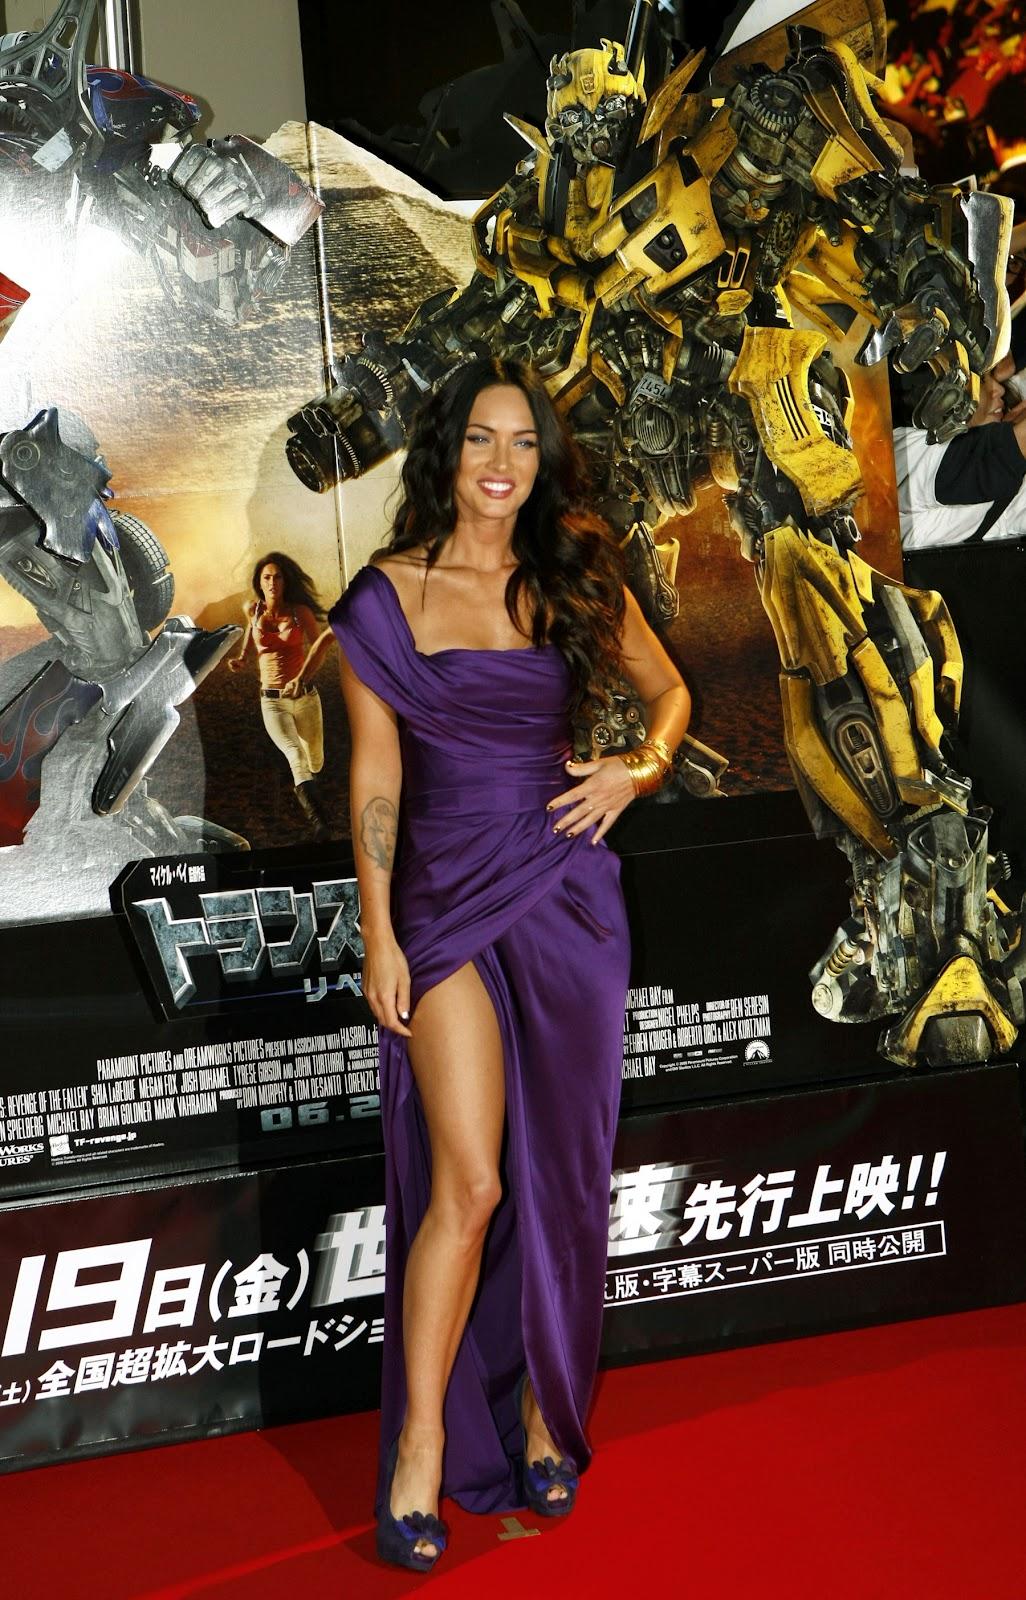 Shahrukh Khan Hd Wallpapers 2012 Megan Fox In Transformers Hd Wallpapers High Definition